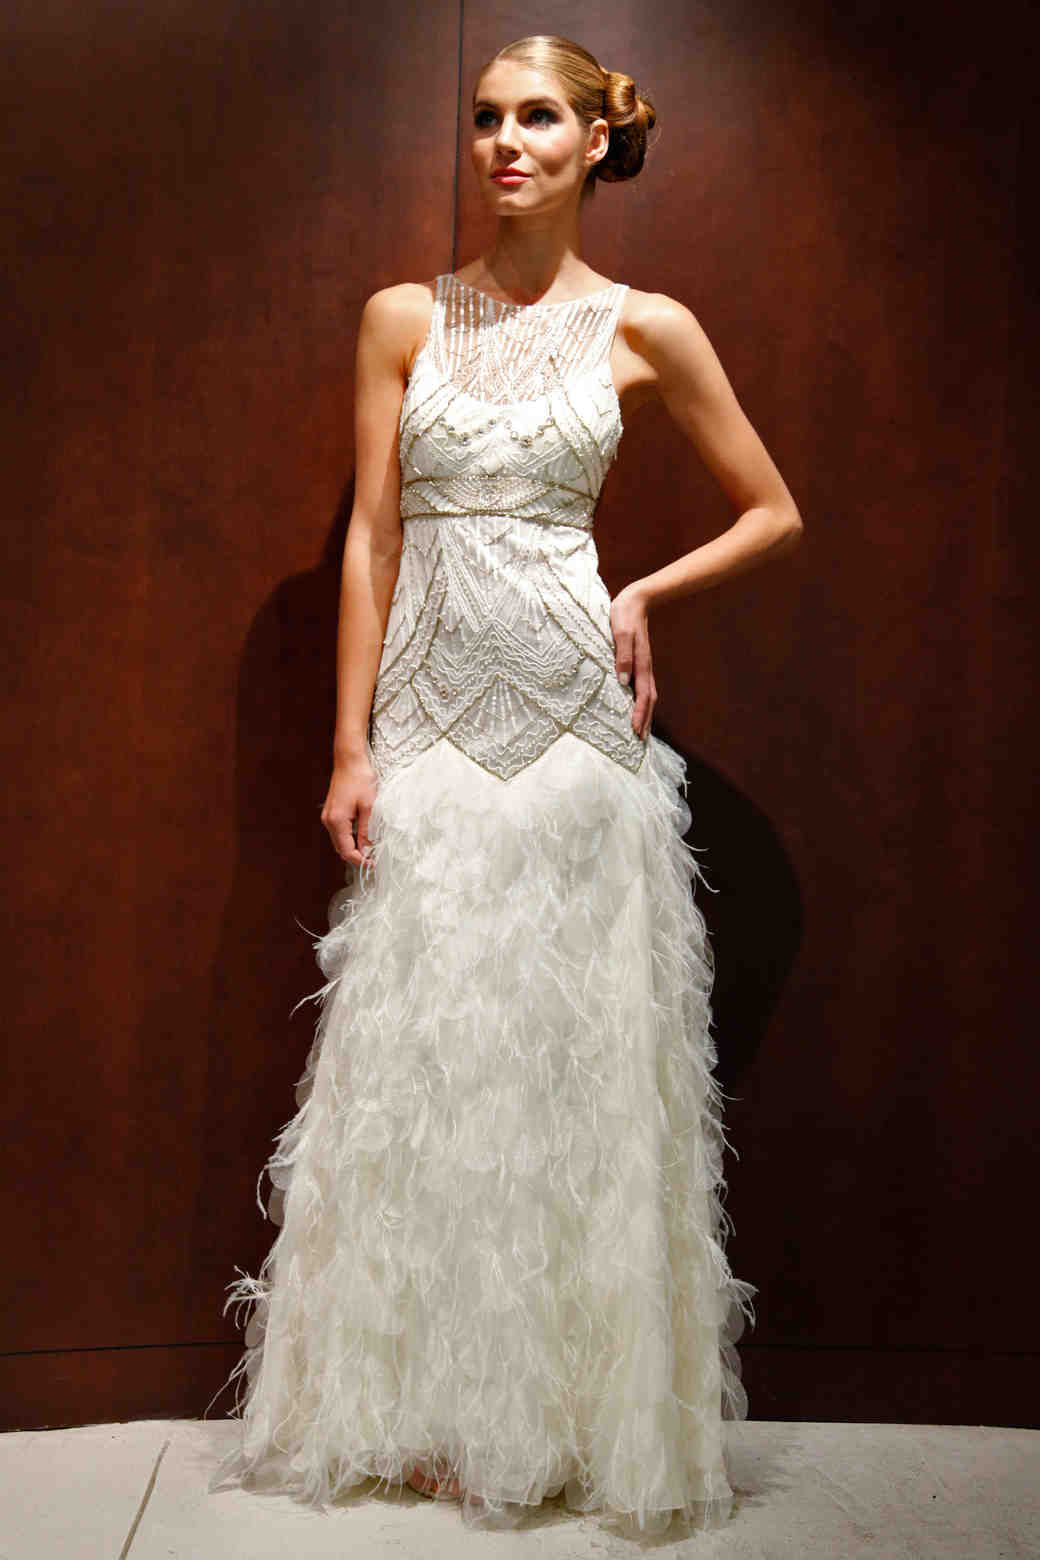 Glamorous Old Hollywood-Style Wedding Dresses, Fall 2012 ...